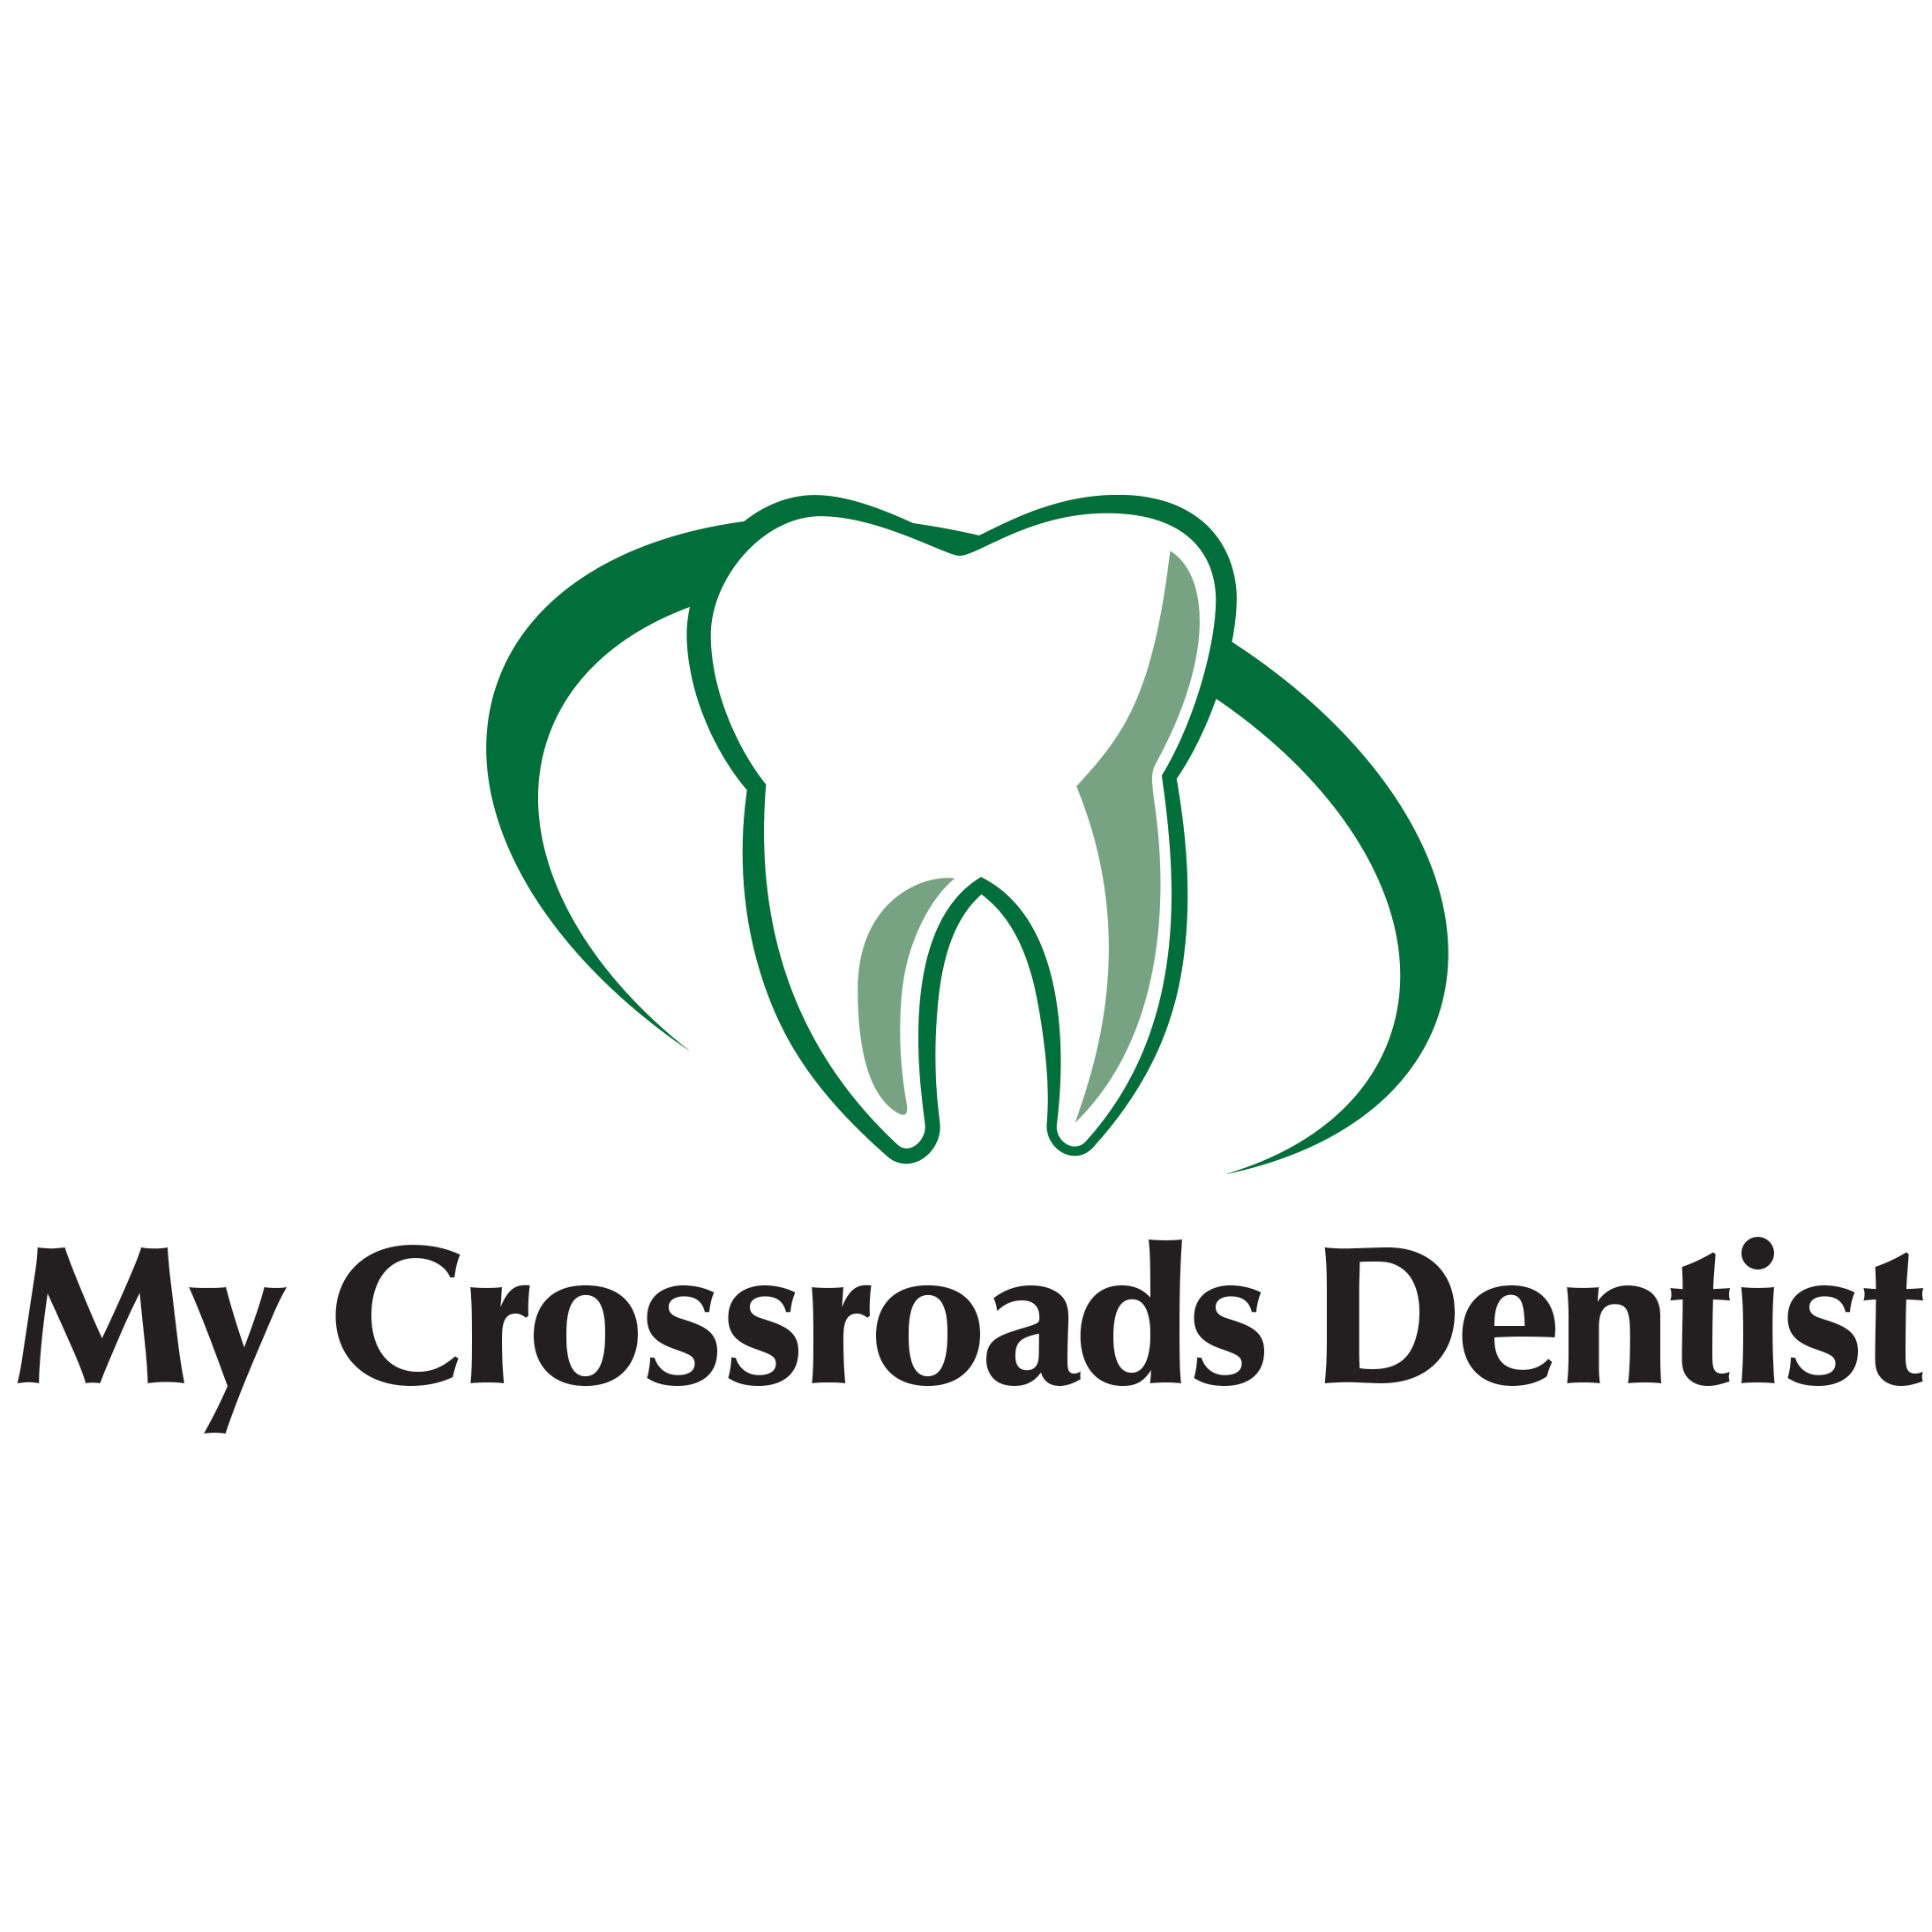 My Crossroads Dentist